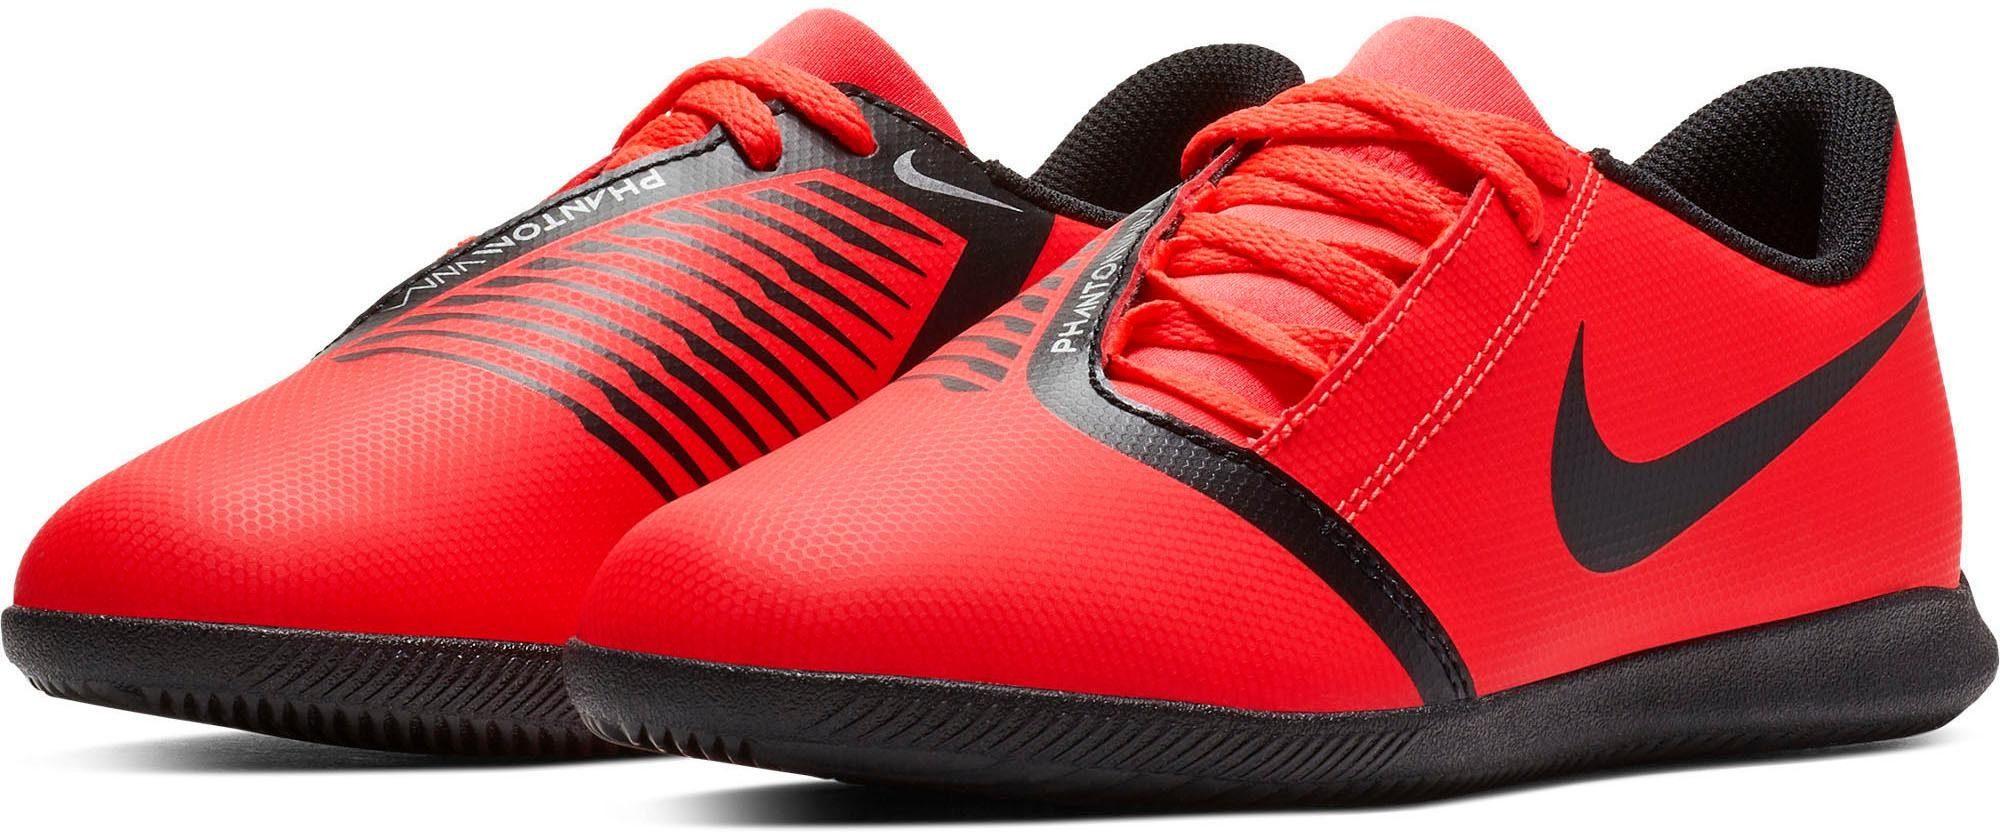 Fußballschuh Nike Club »Jr Phantom Venom IC« HalleOTTO 4R3jLcqS5A